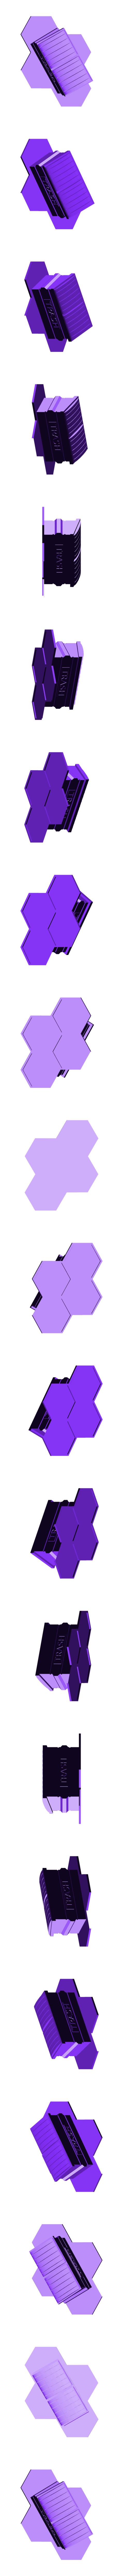 Dumpster_4_Hex.stl Download free STL file Hex Terrain City Set 1 • Model to 3D print, mrhers2